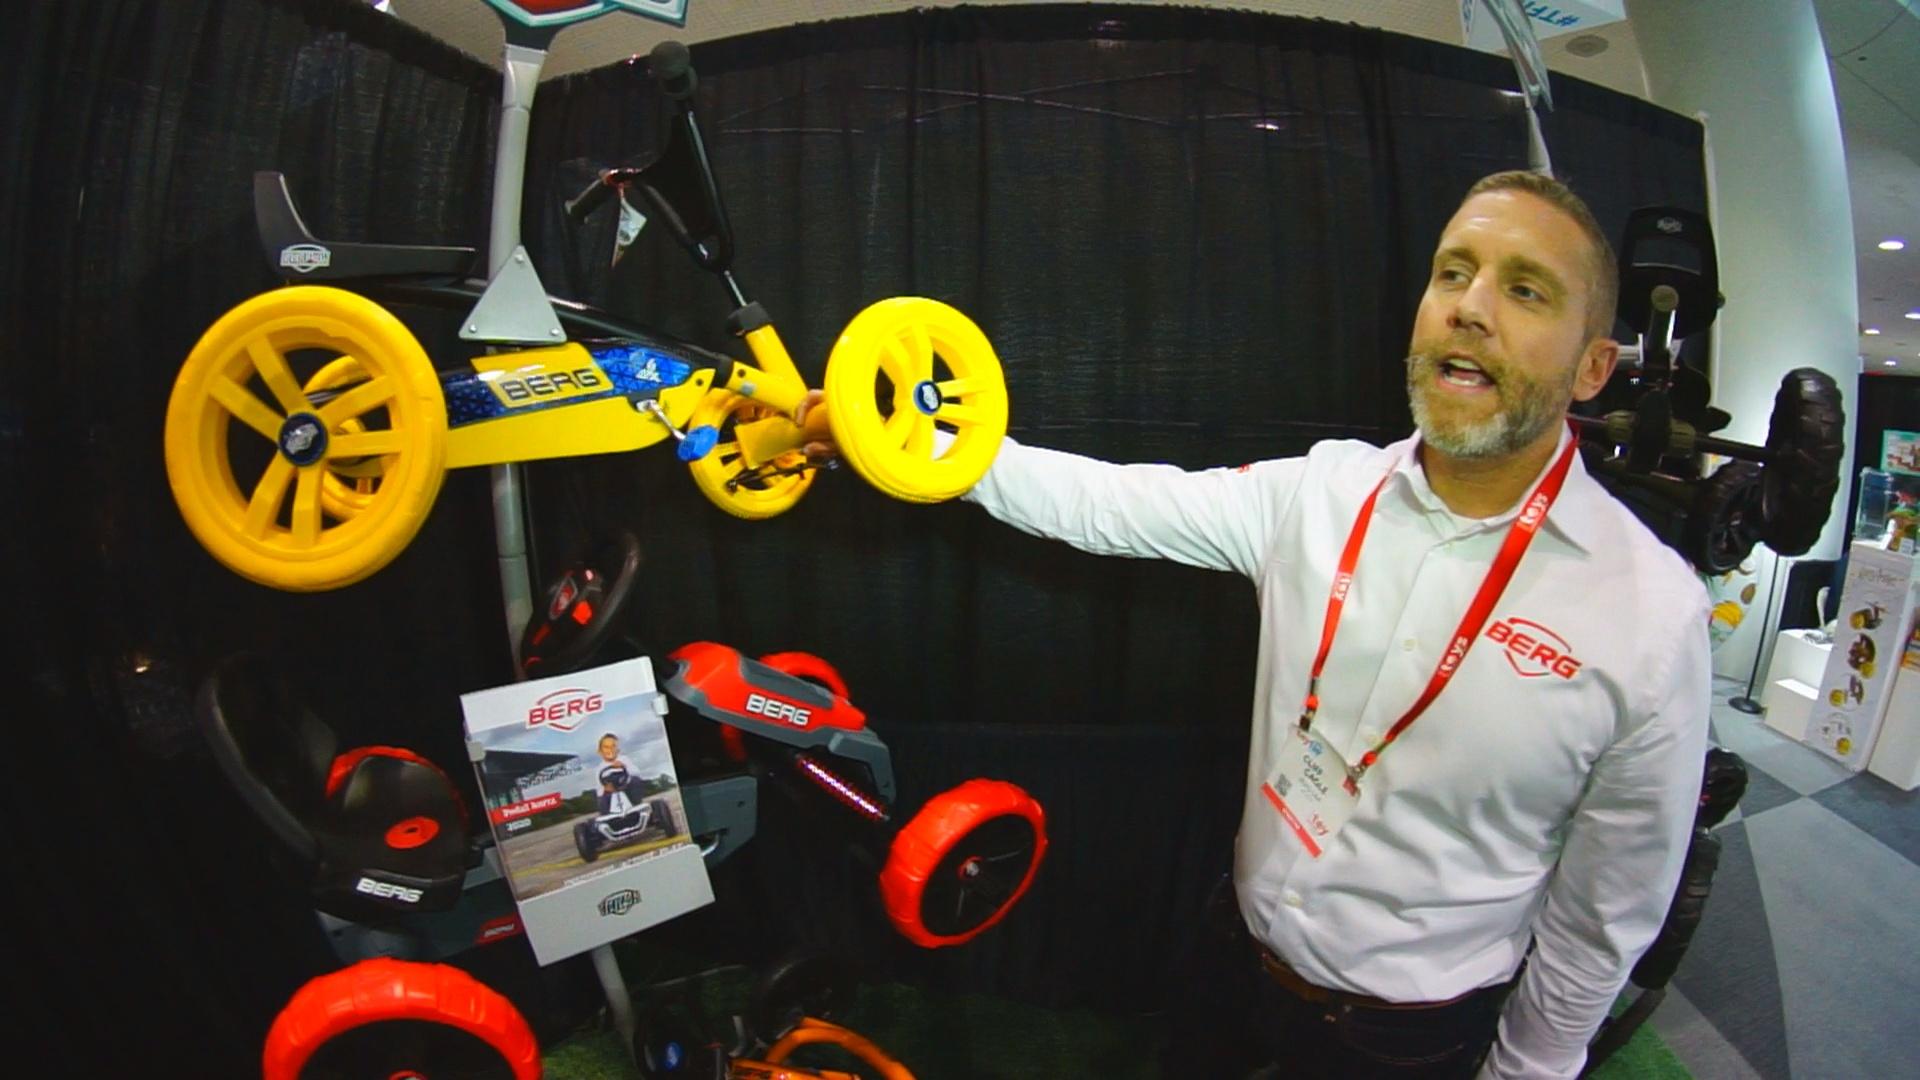 Berg Toys 2020